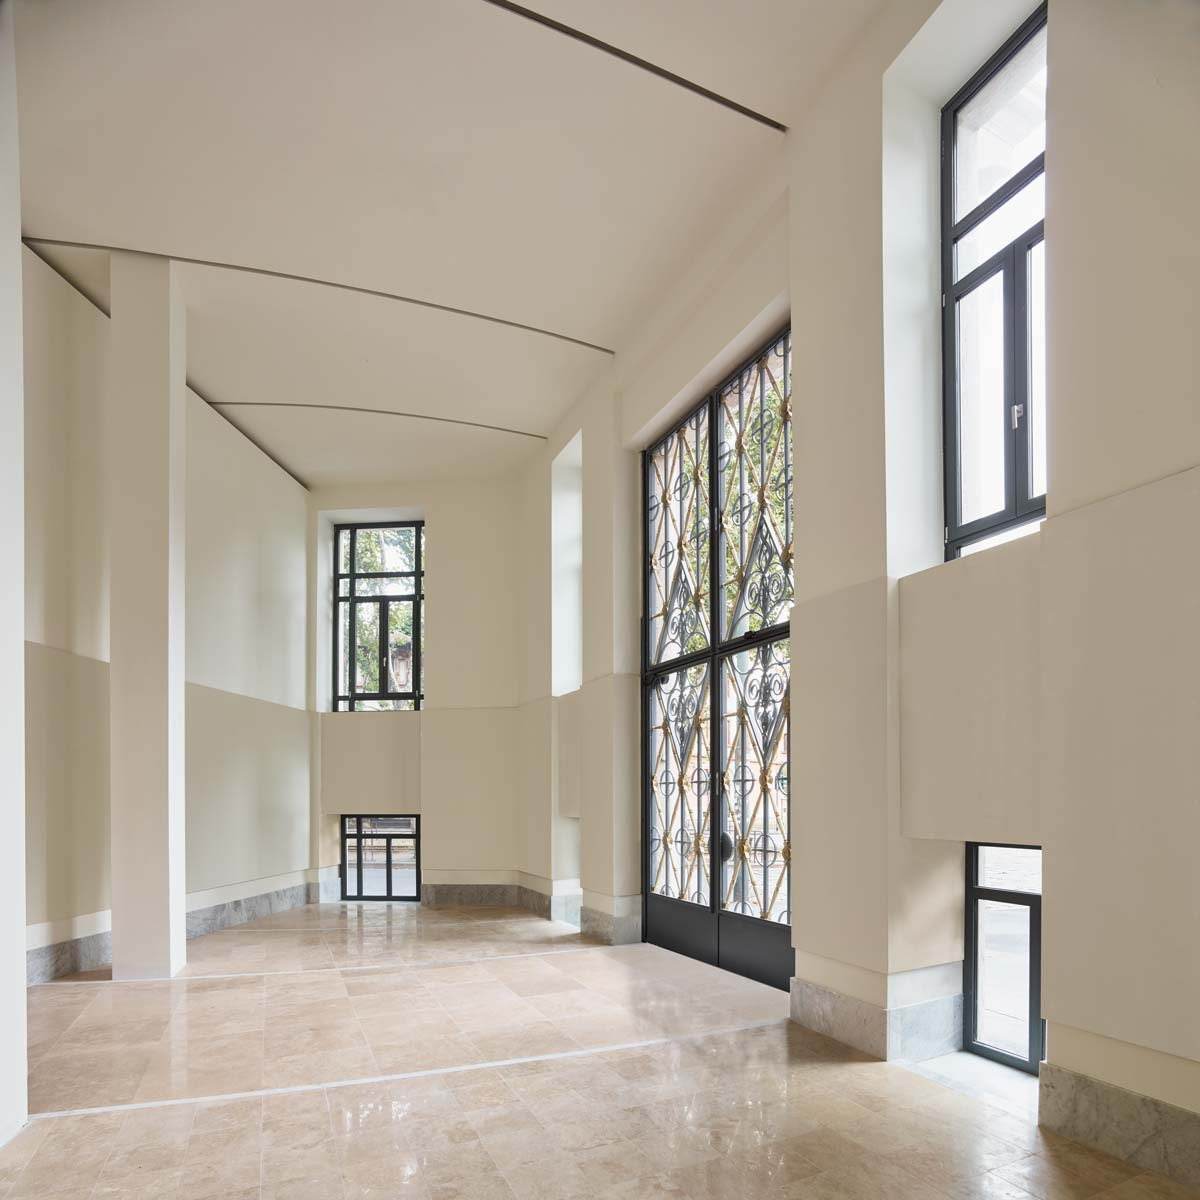 Degli-Esposti-Architetti-Milan-Residenze-Carlo-Erba-10